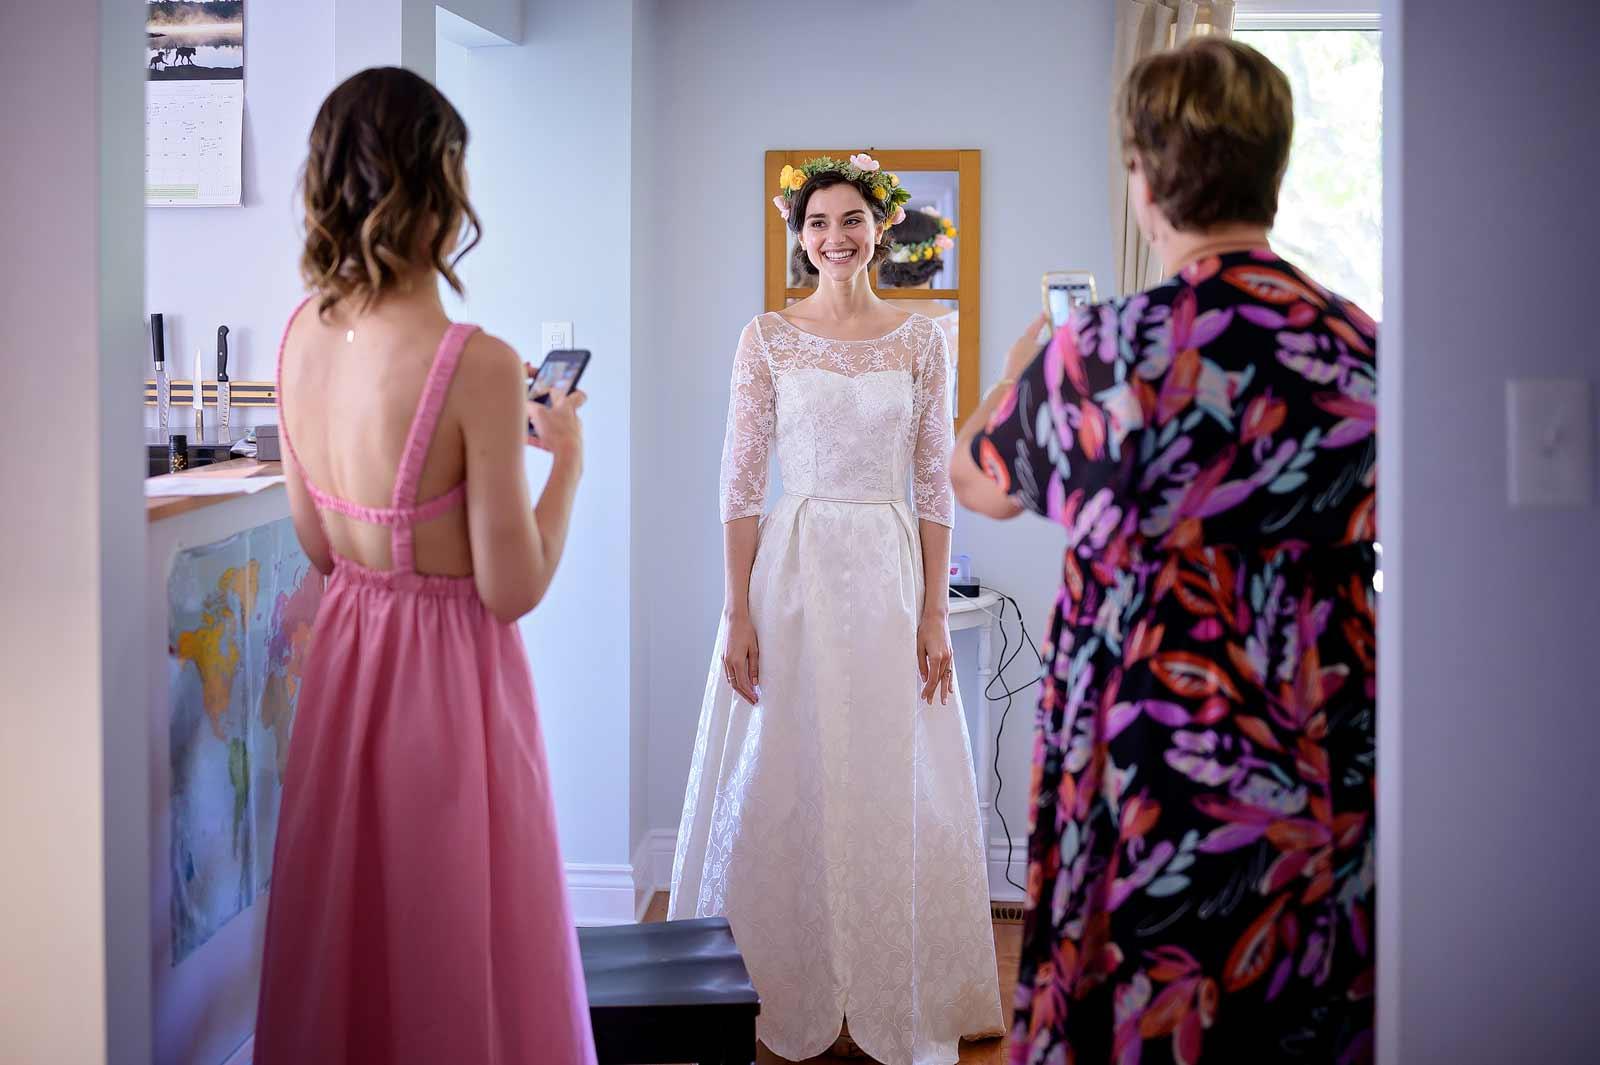 rebeccatrevor-wedding-sneakpeek-06